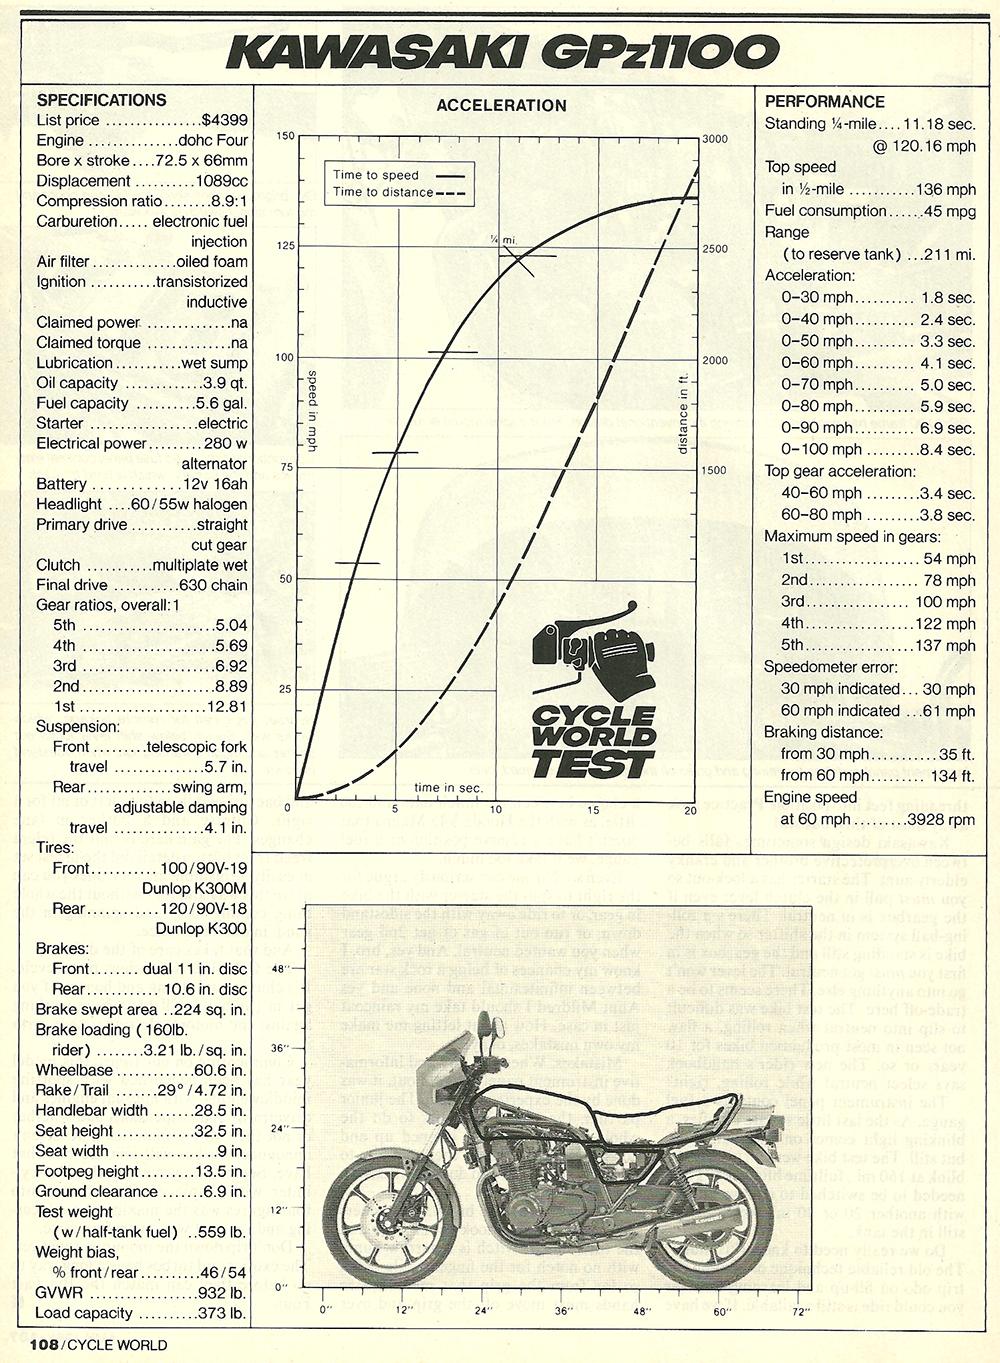 1982 Kawasaki GPz1100 road test 06.jpg